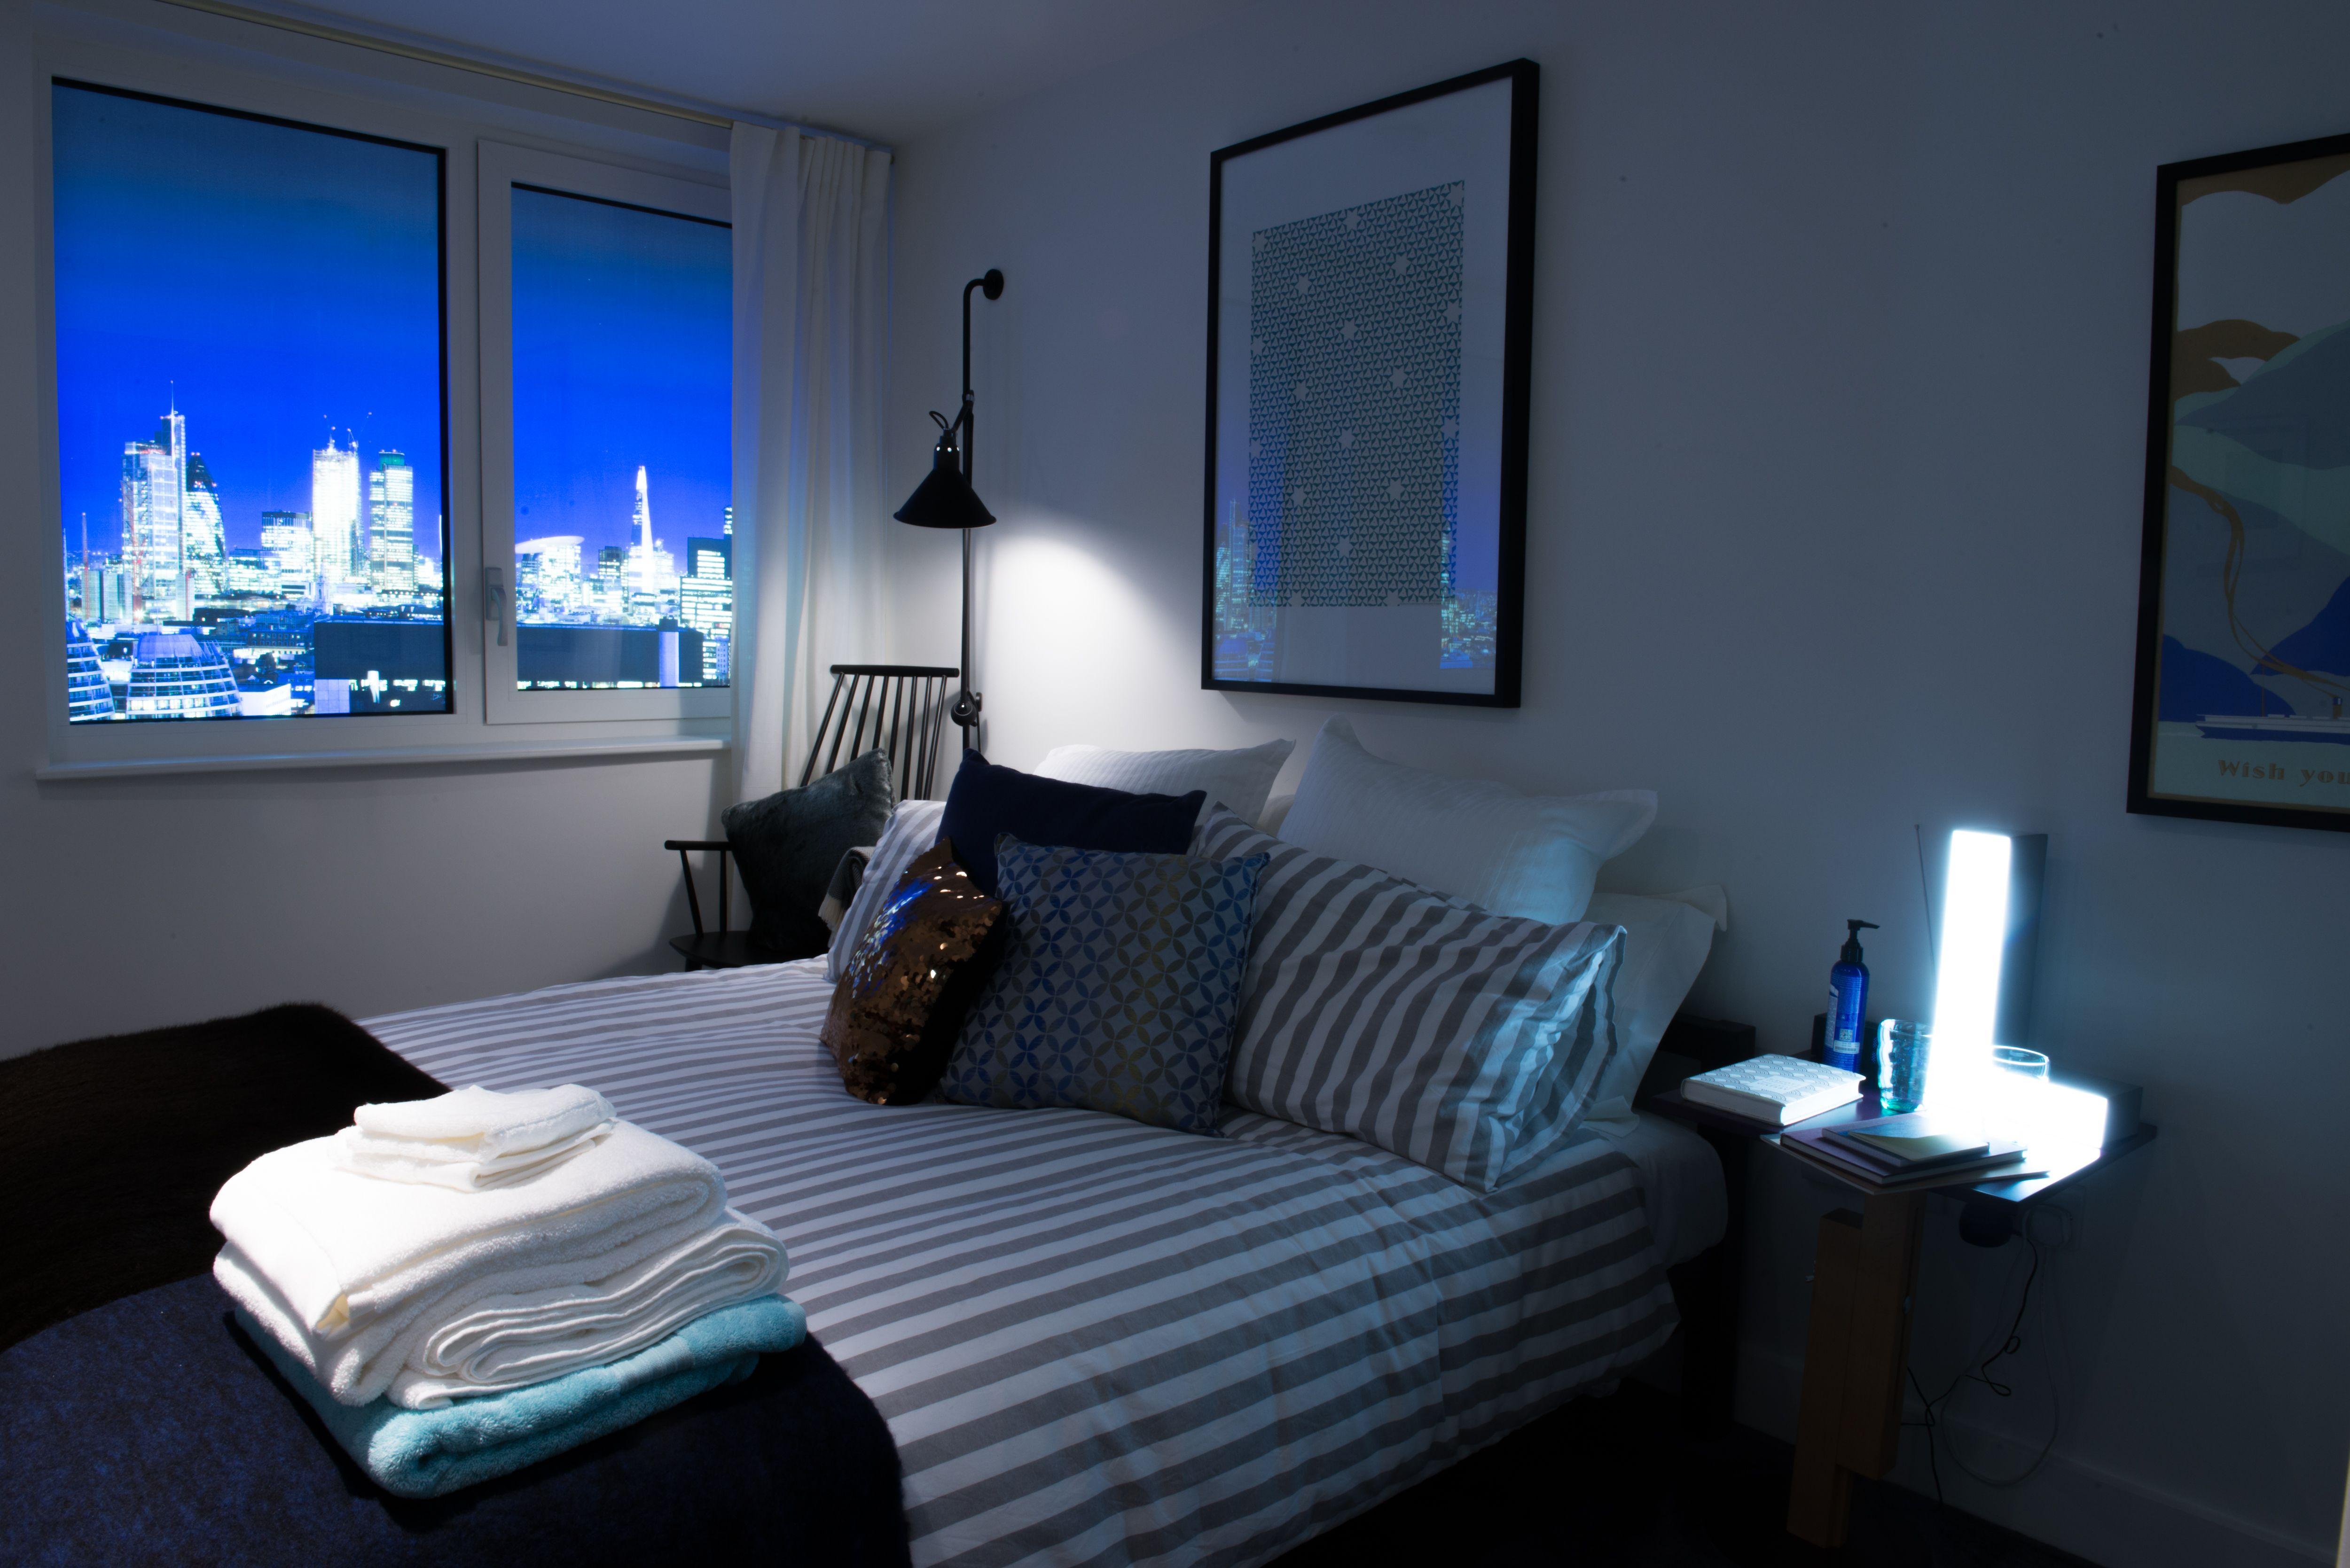 #Oldstnewrules #Apartment #Luxury #Bedroom #Decor #Furnishing #Artdeco